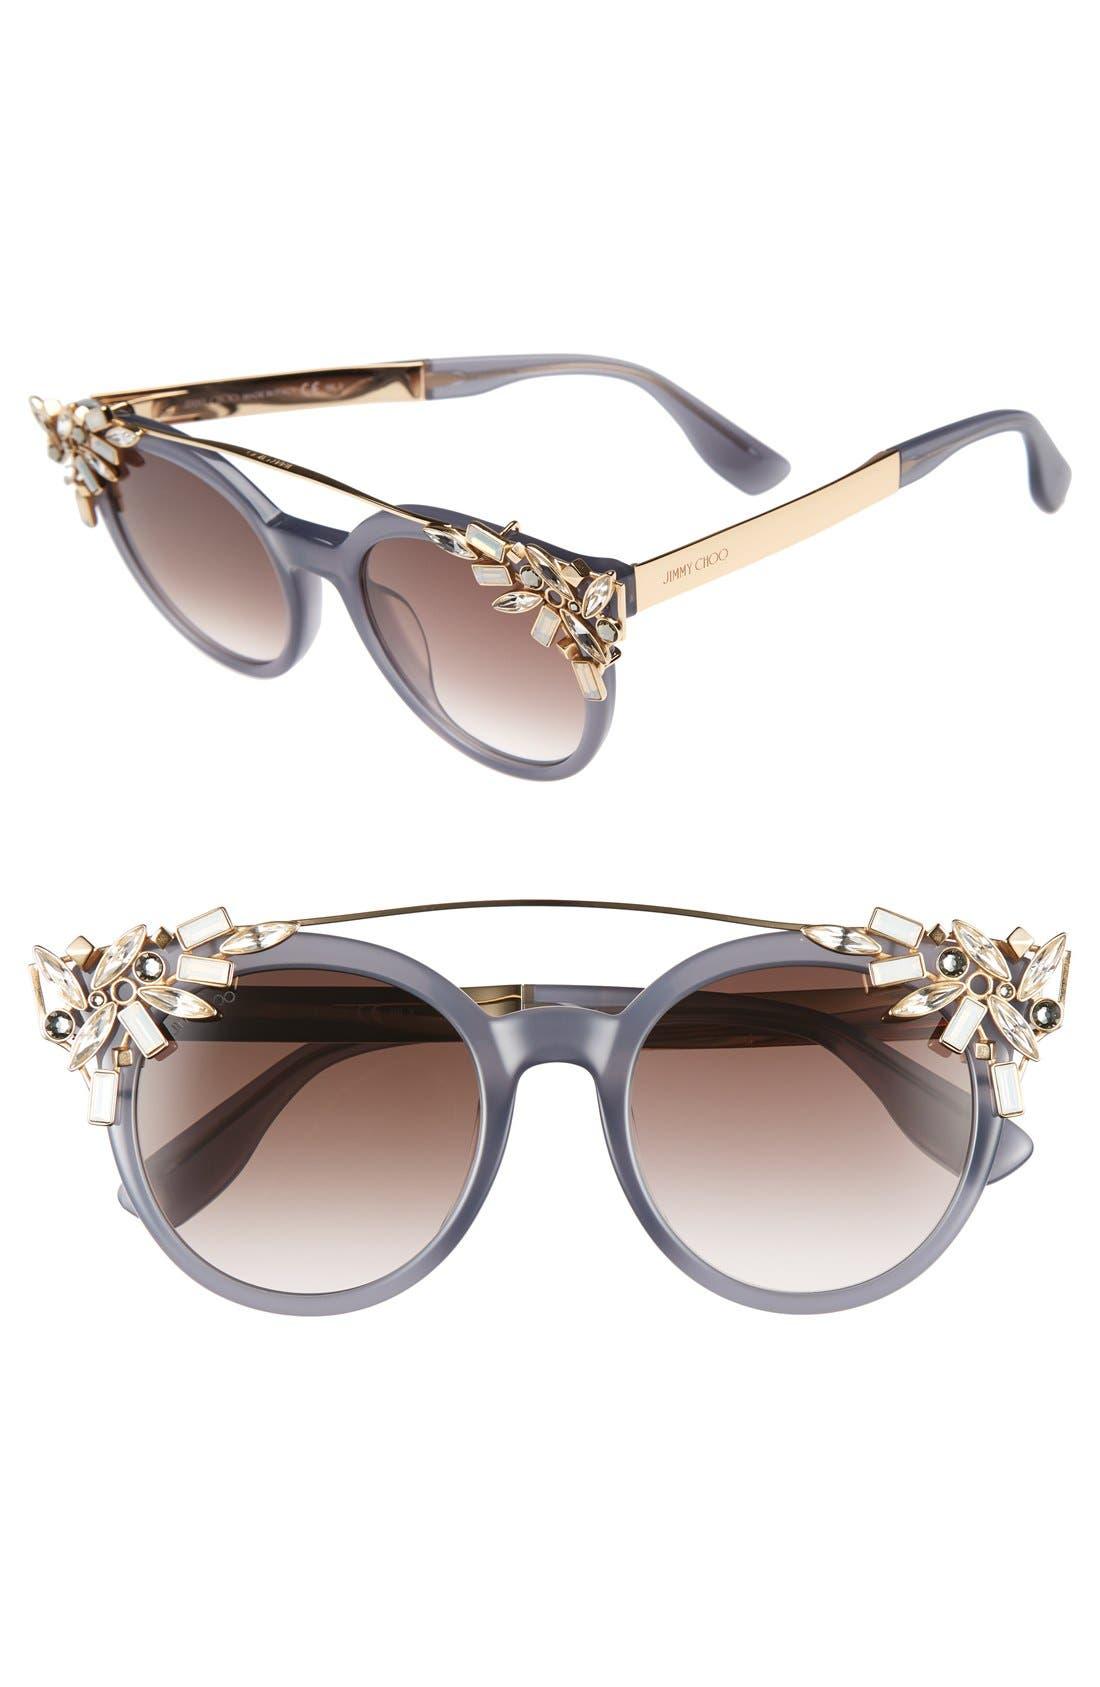 Alternate Image 1 Selected - Jimmy Choo 'Vivy' 51mm Sunglasses